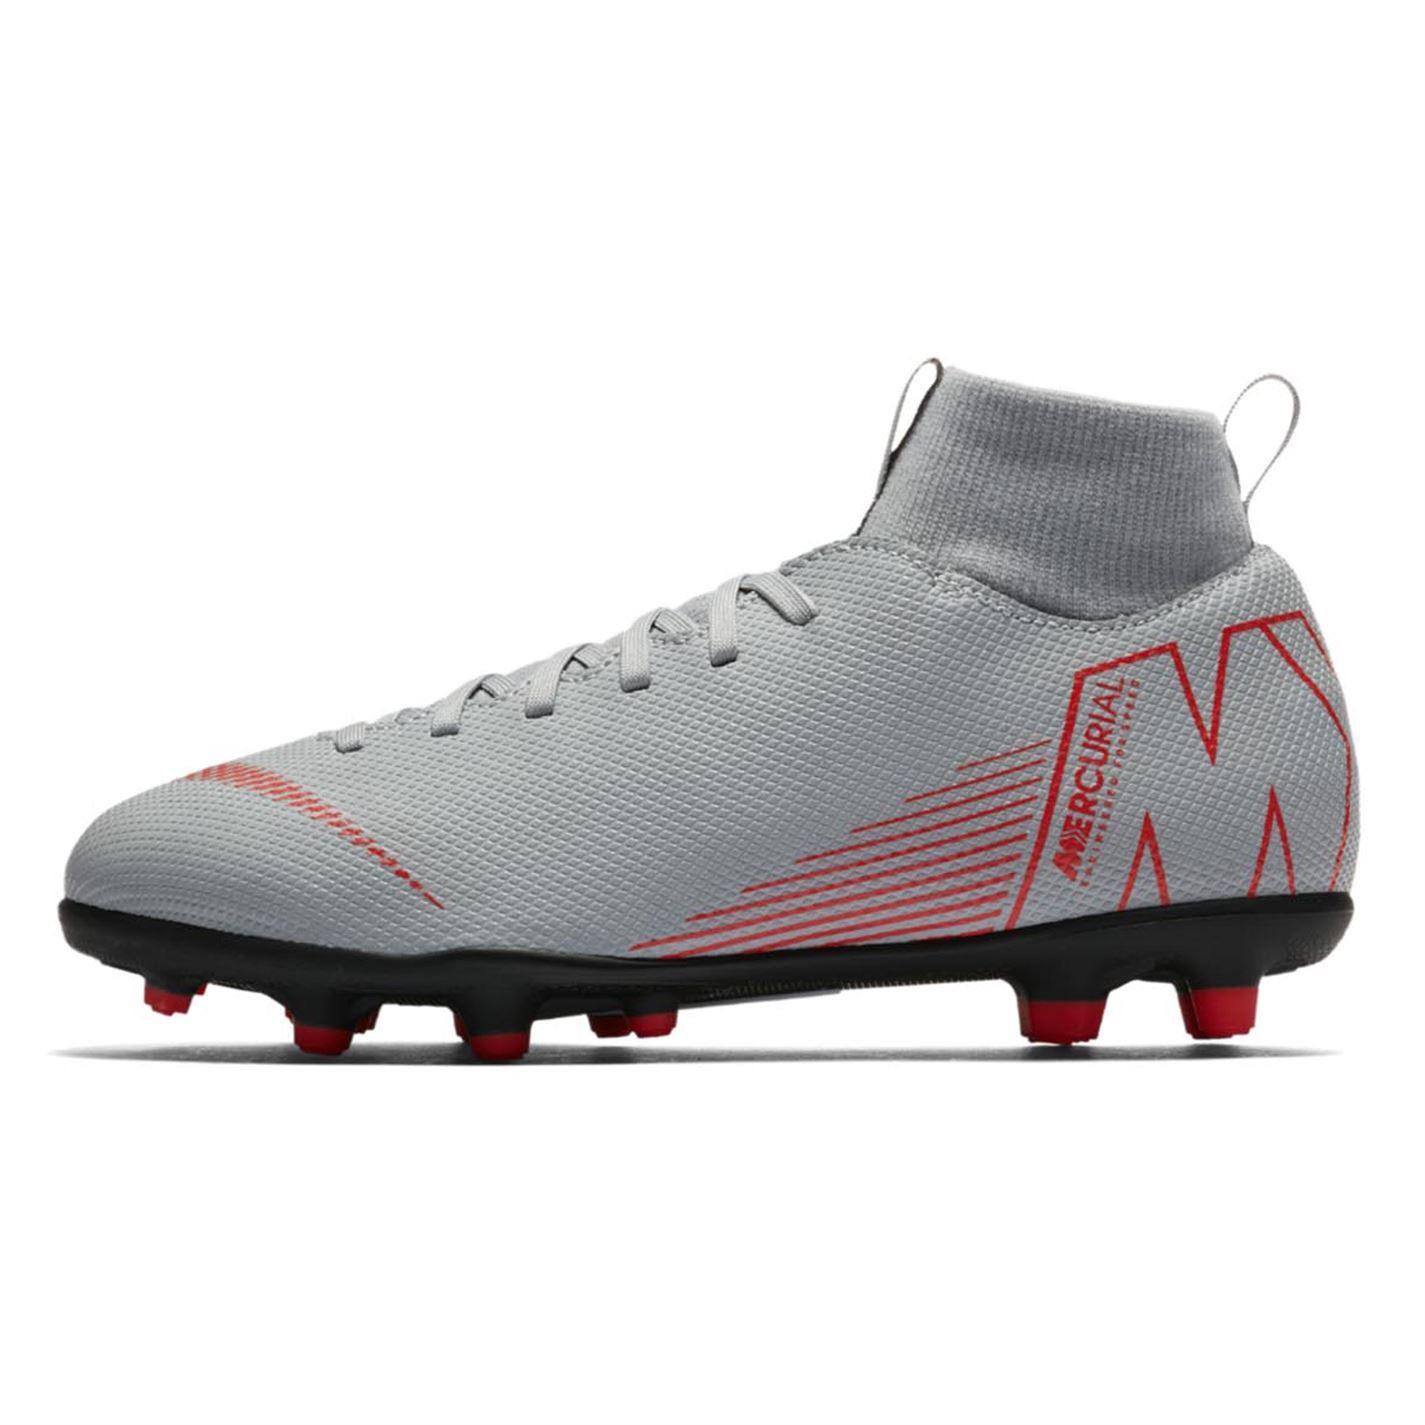 Nike-MERCURIAL-SUPERFLY-Club-DF-TERRA-FERMA-SCARPE-DA-CALCIO-JUNIOR-CALCIO-Cunei miniatura 10